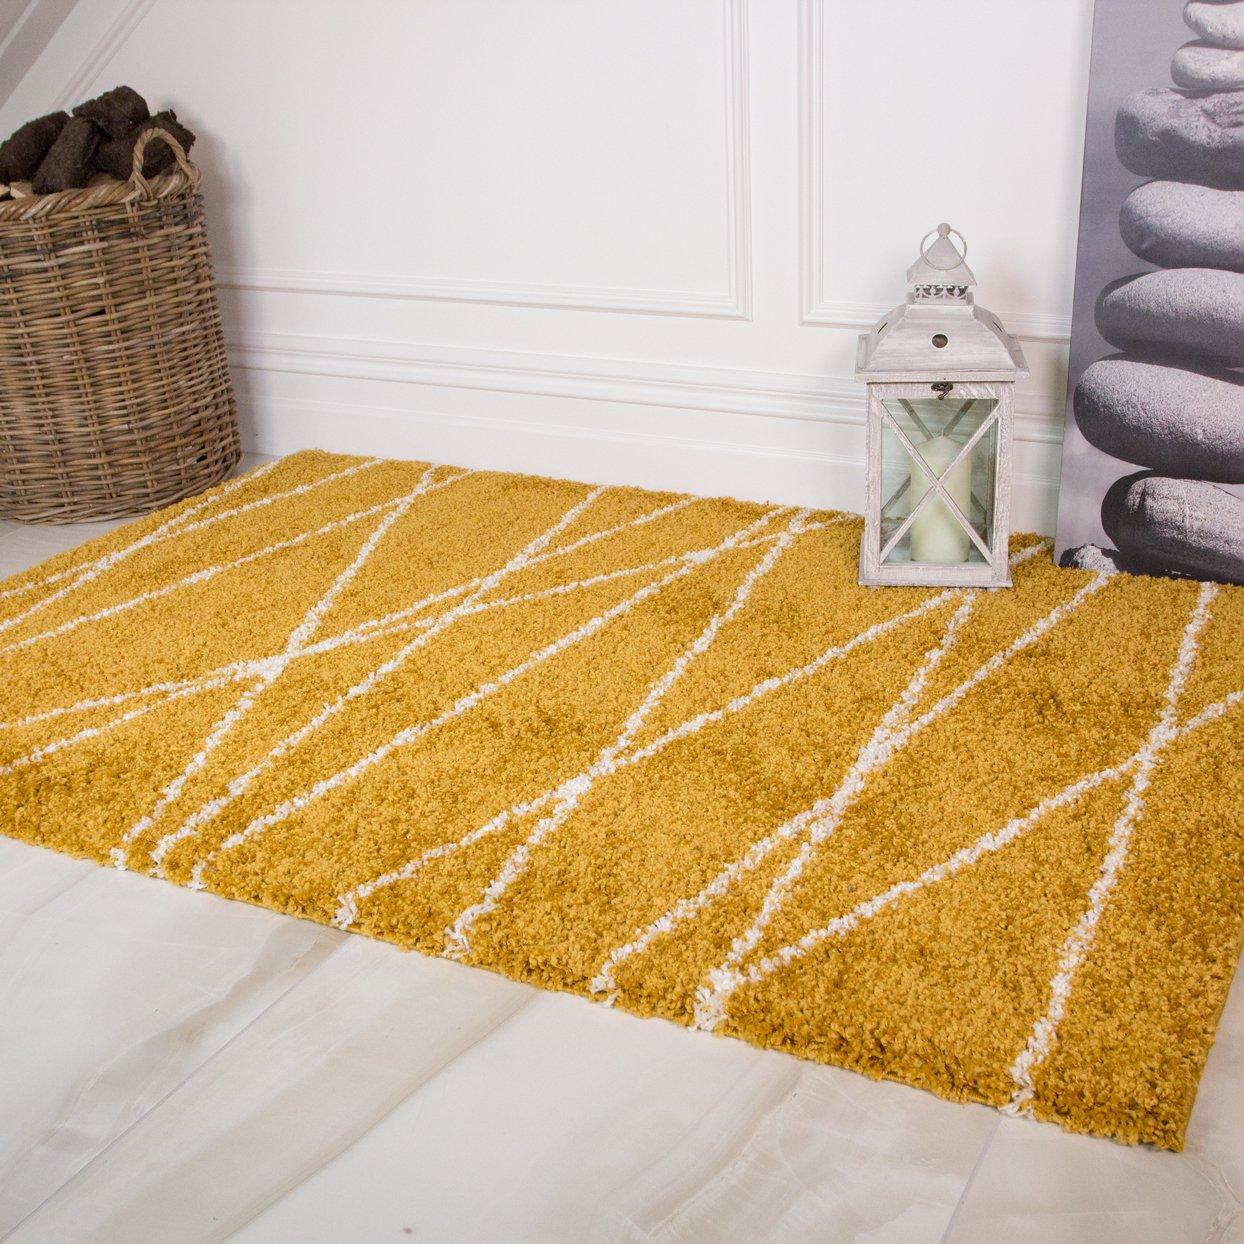 Ochre Yellow Mustard Zig Zag Chevron Geometric Fluffy Shaggy Thick Area Rugs Ebay